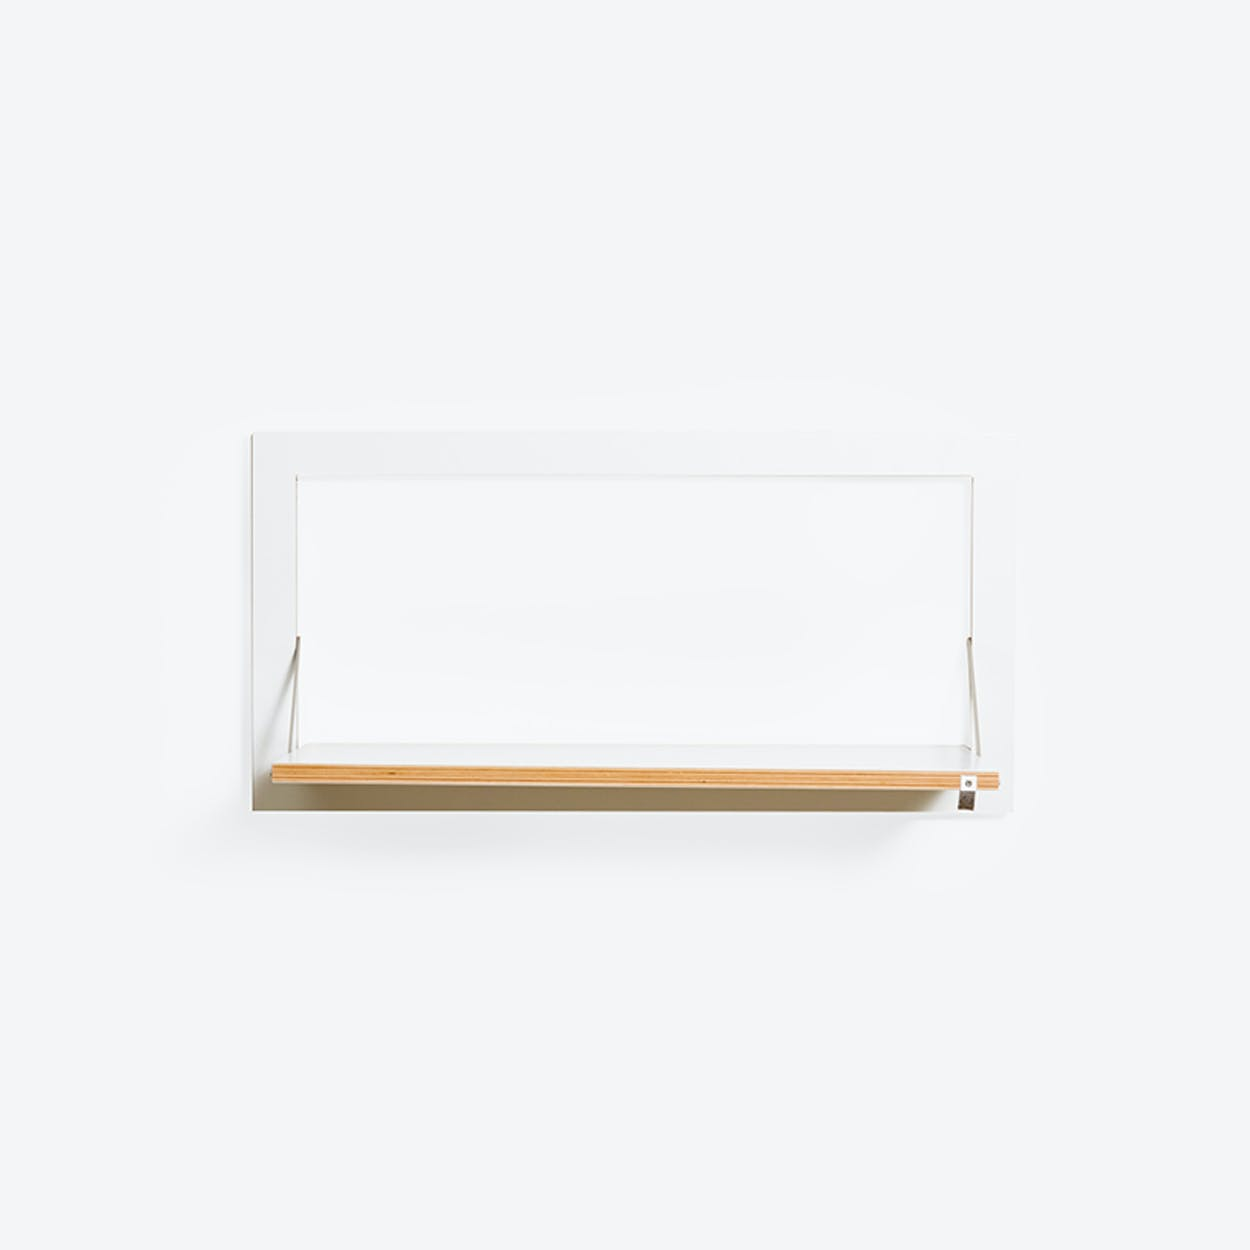 Fläpps Shelf 80x40-1 - White